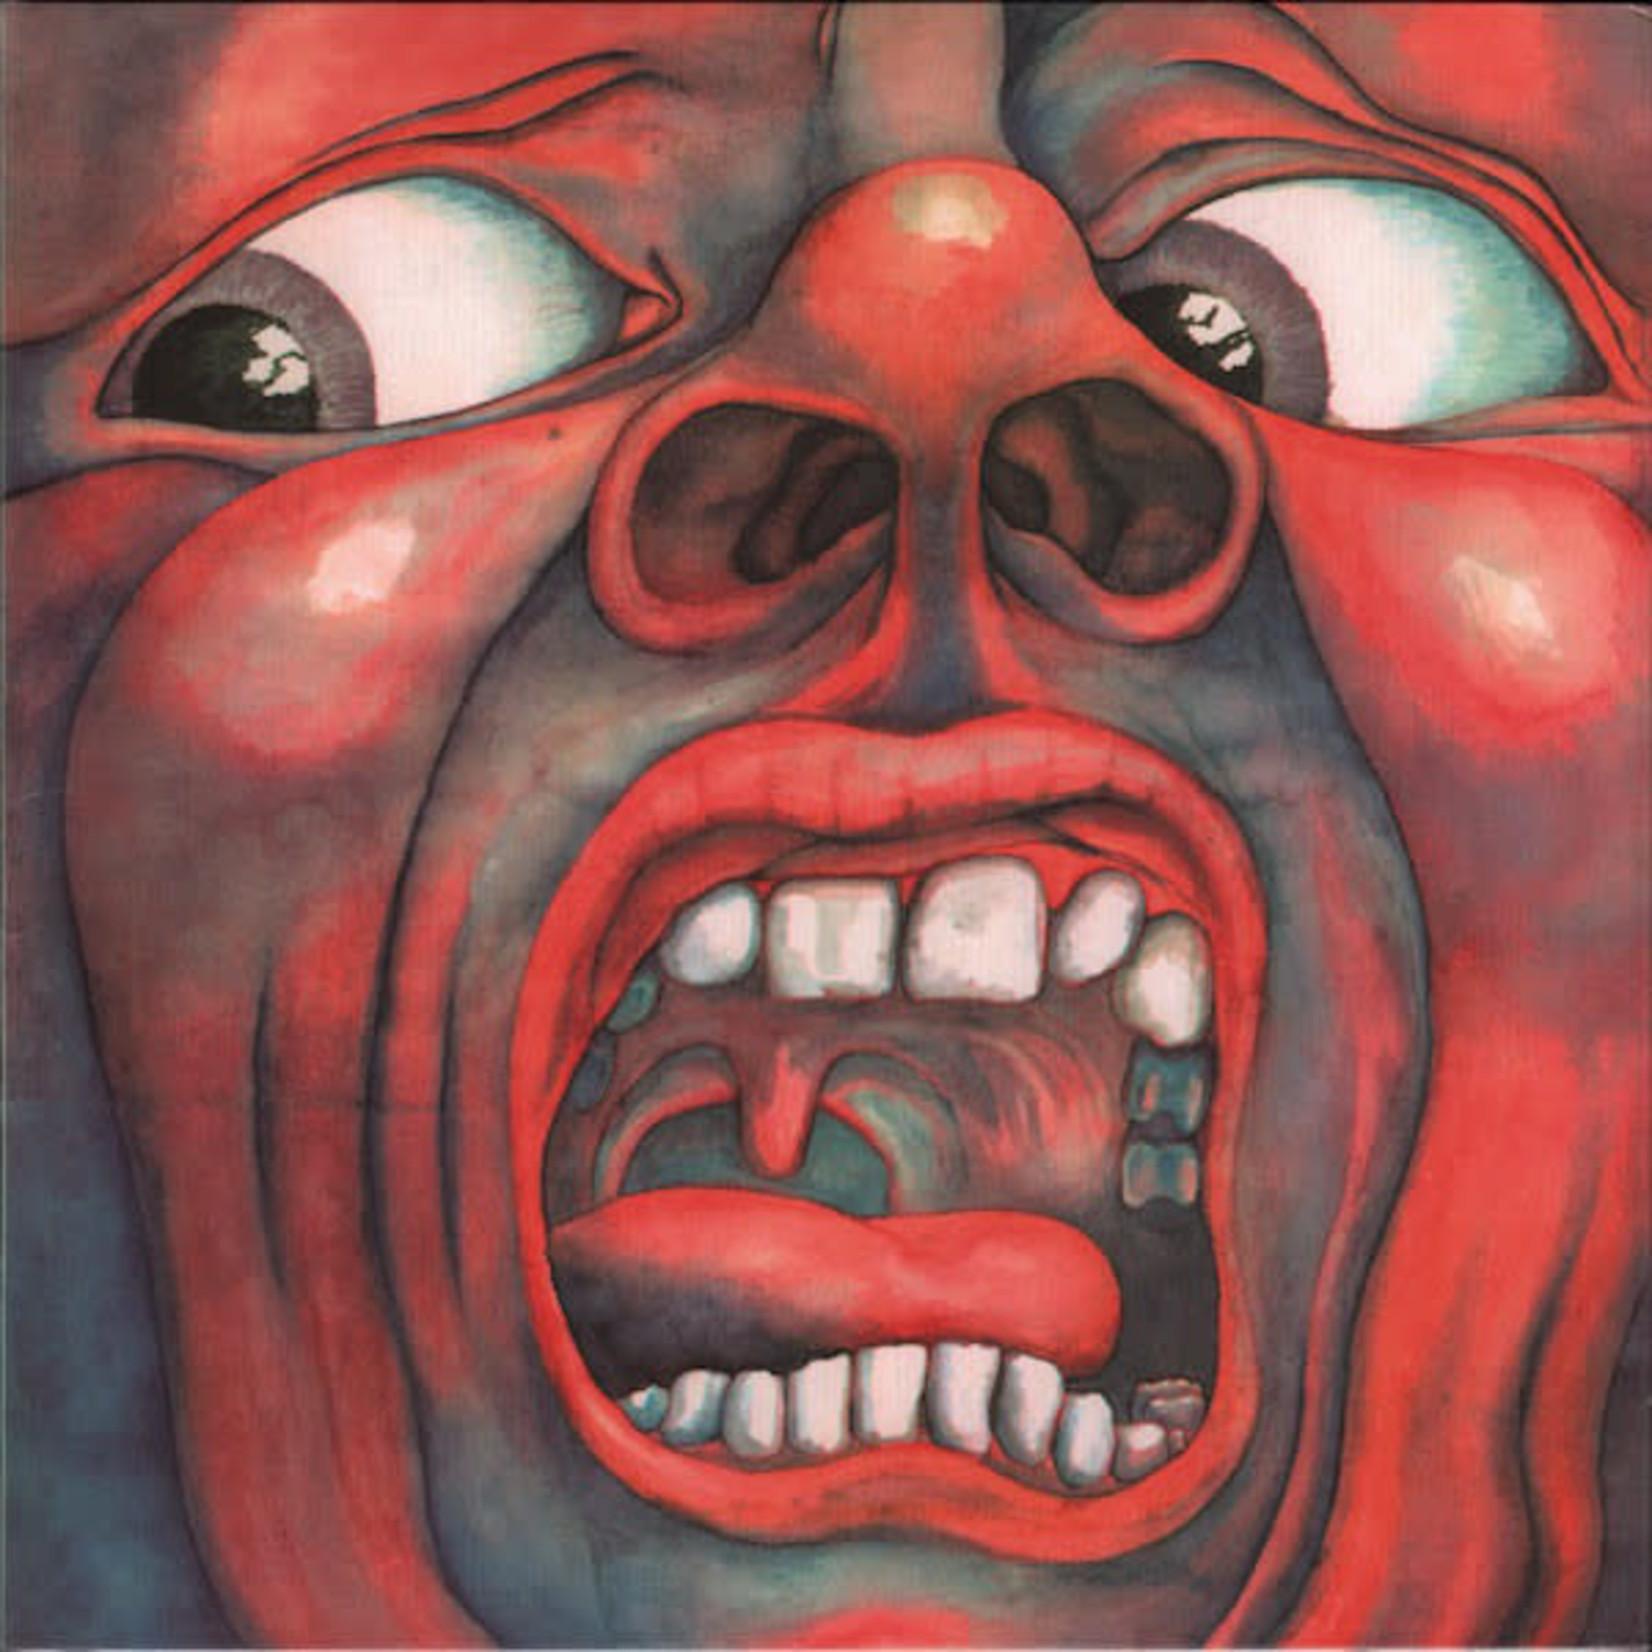 [Vintage] King Crimson: In the Court of the Crimson King (reissue)